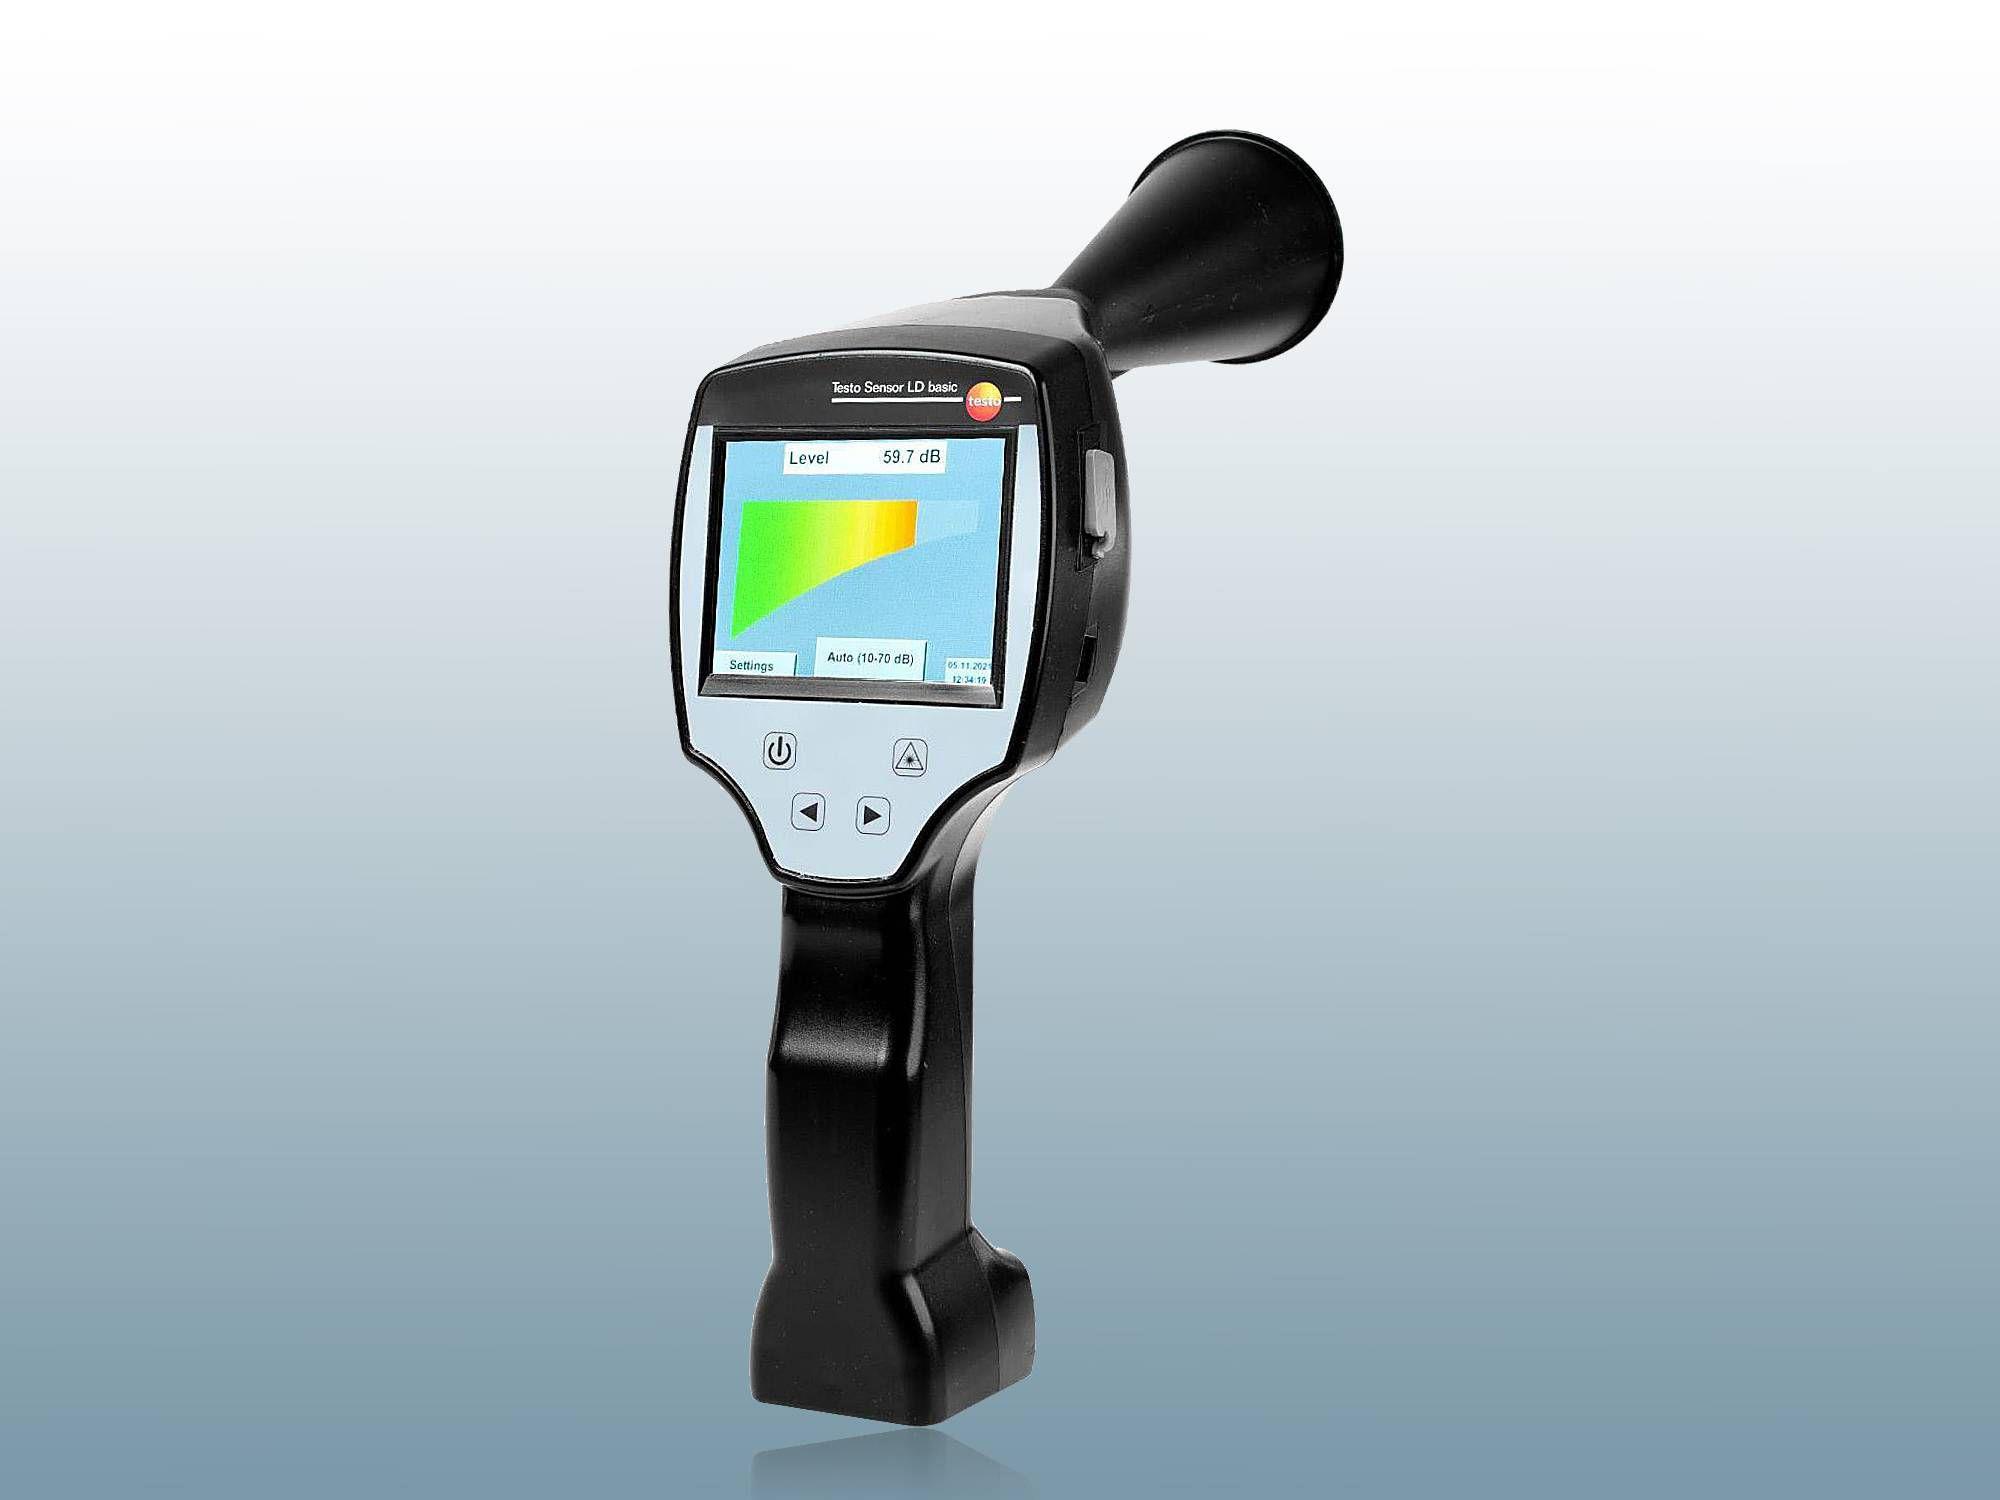 <p>testo Sensor LD</p><p>Leckage-Suchger&auml;t</p>